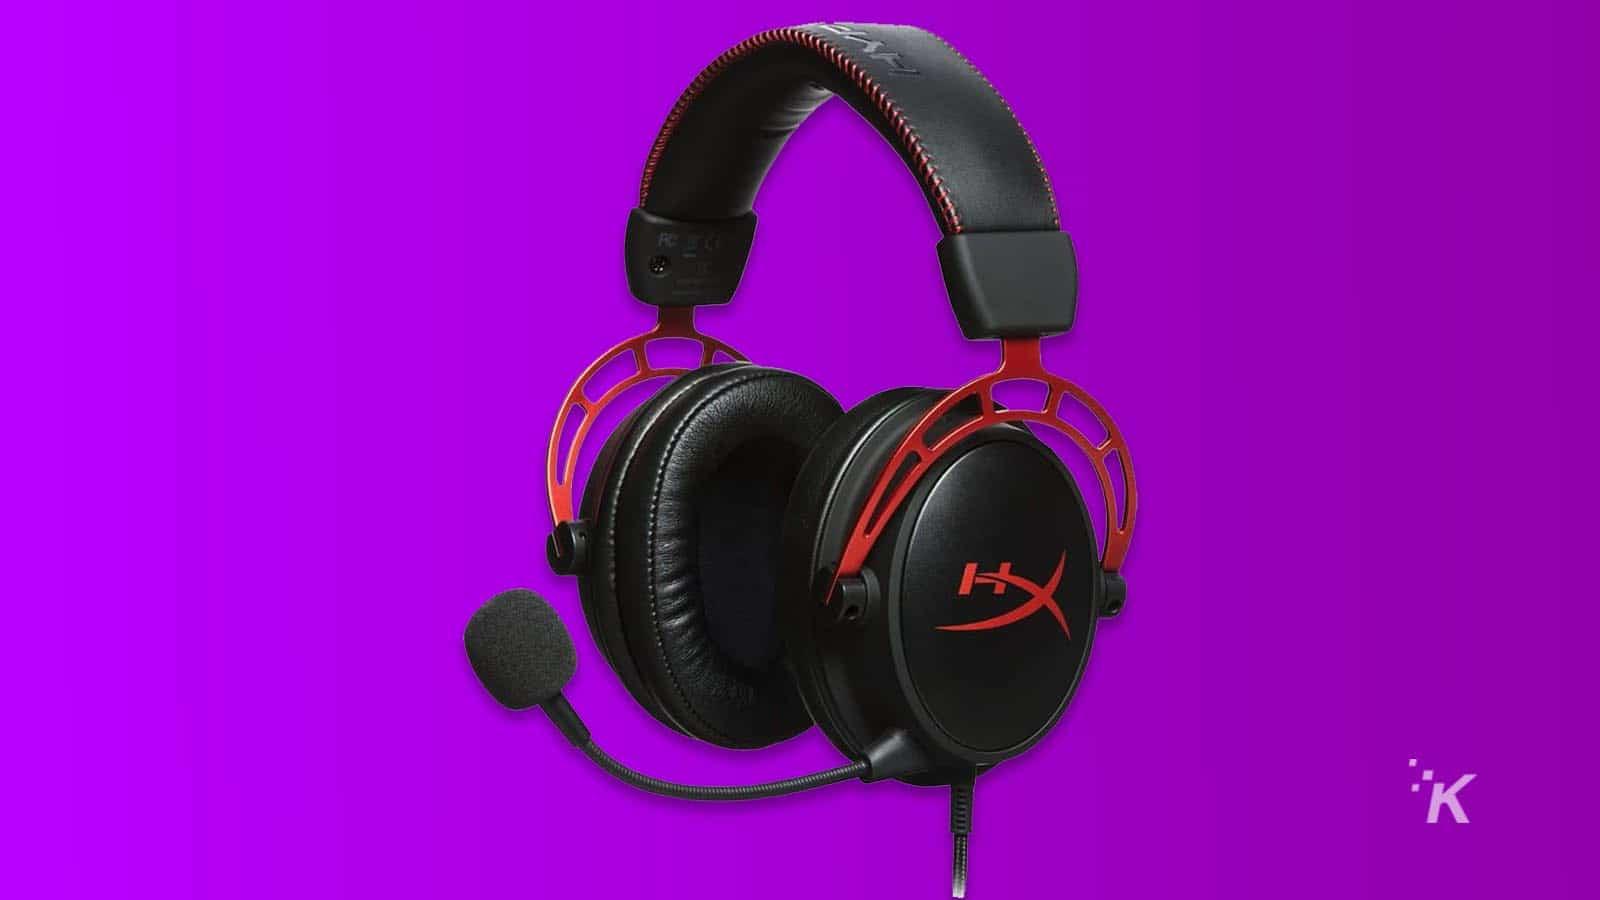 hyper x cloud gaming headset